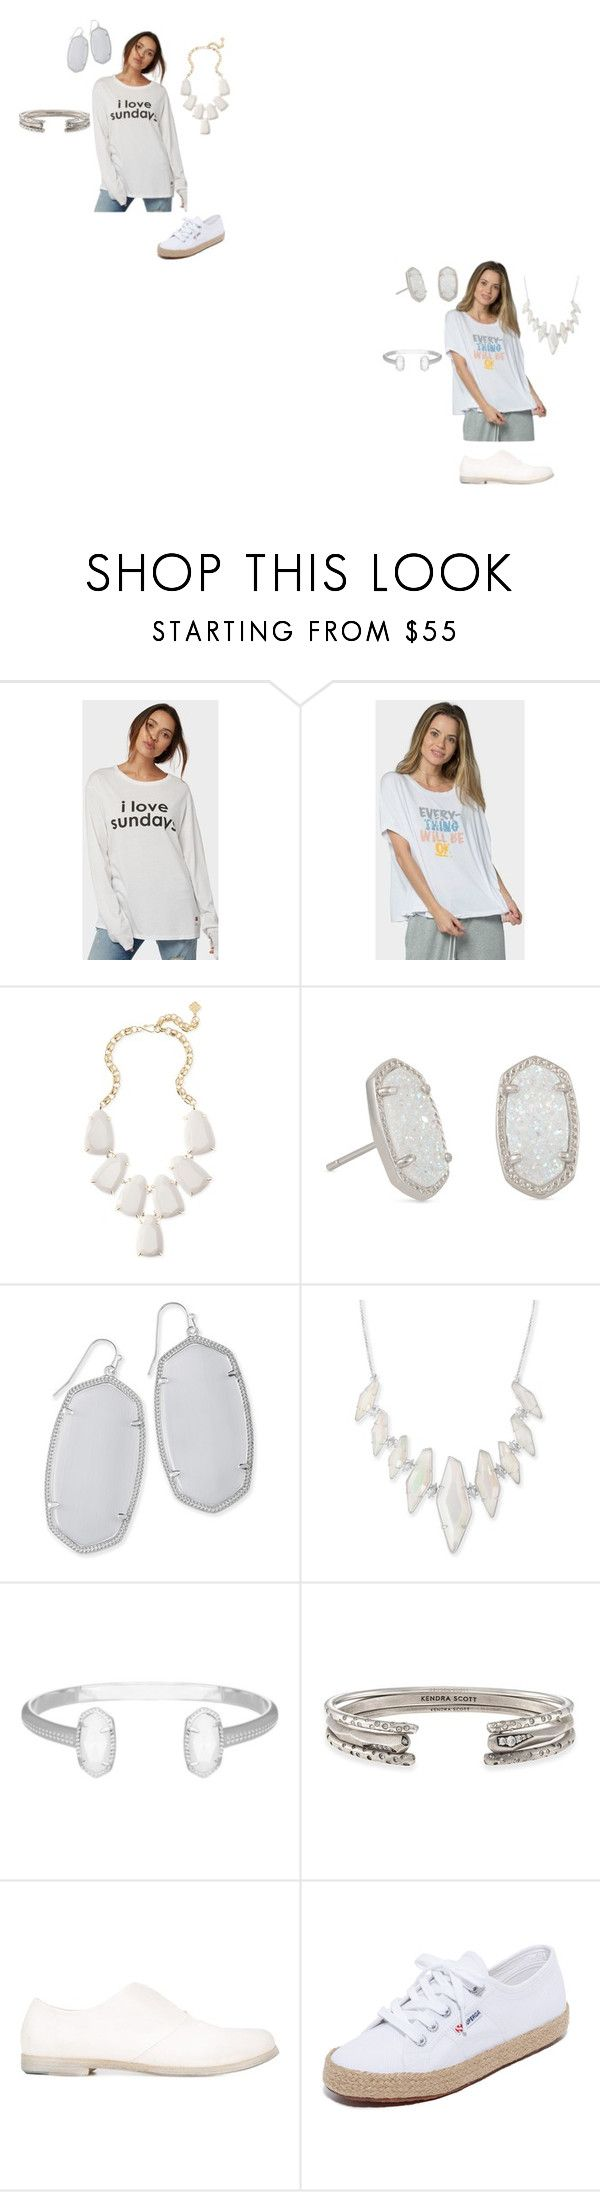 """Dress courtesy"" by ramakumari ❤ liked on Polyvore featuring Peace Love World, Kendra Scott, Marsèll, Superga, Summer, summerstyle, fashionable, fashionset and summer2017"